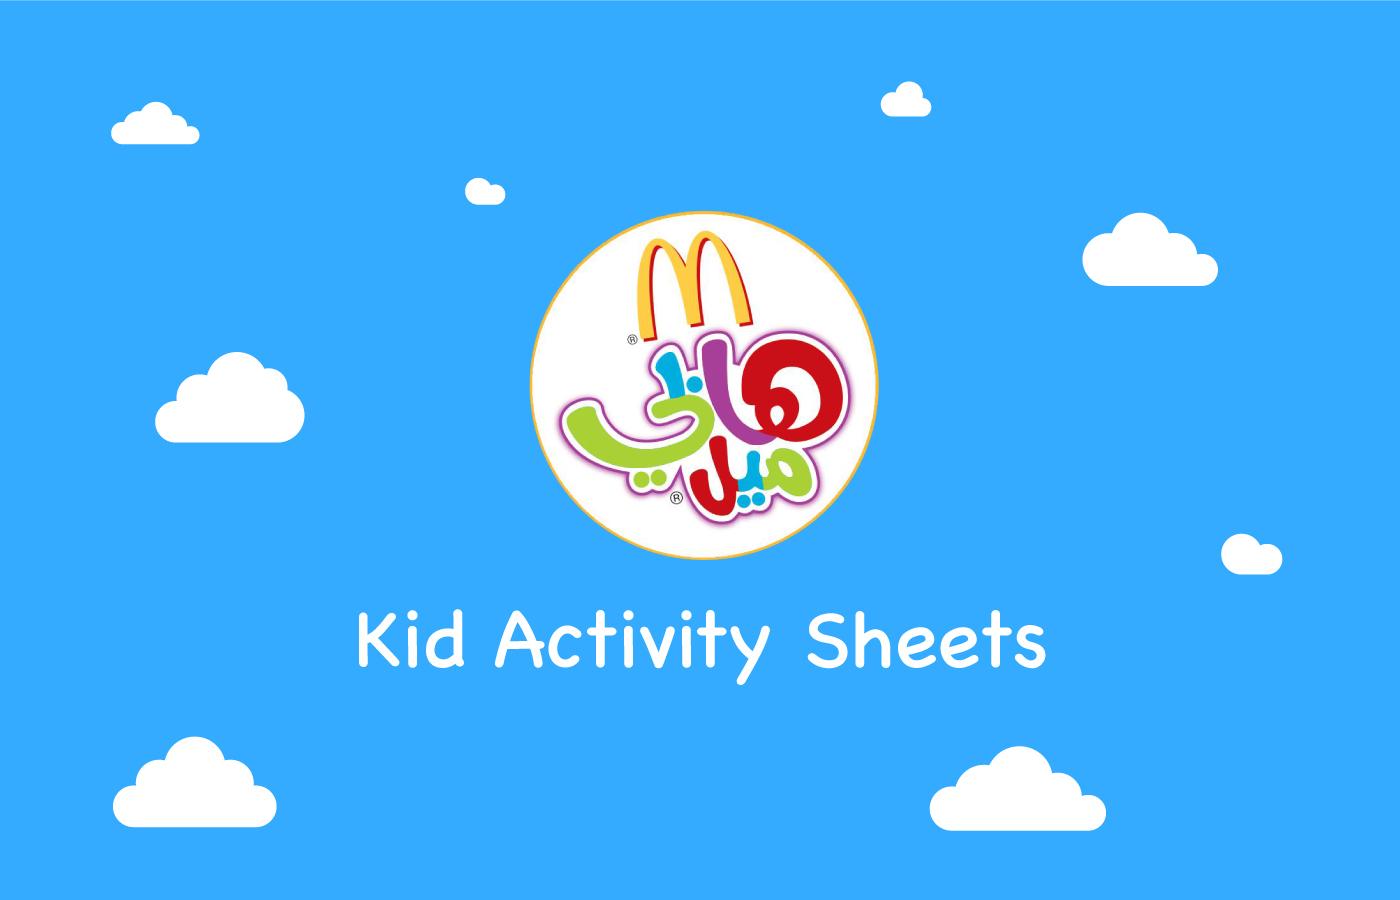 McDonald\'s Kid Activity Sheets on Behance